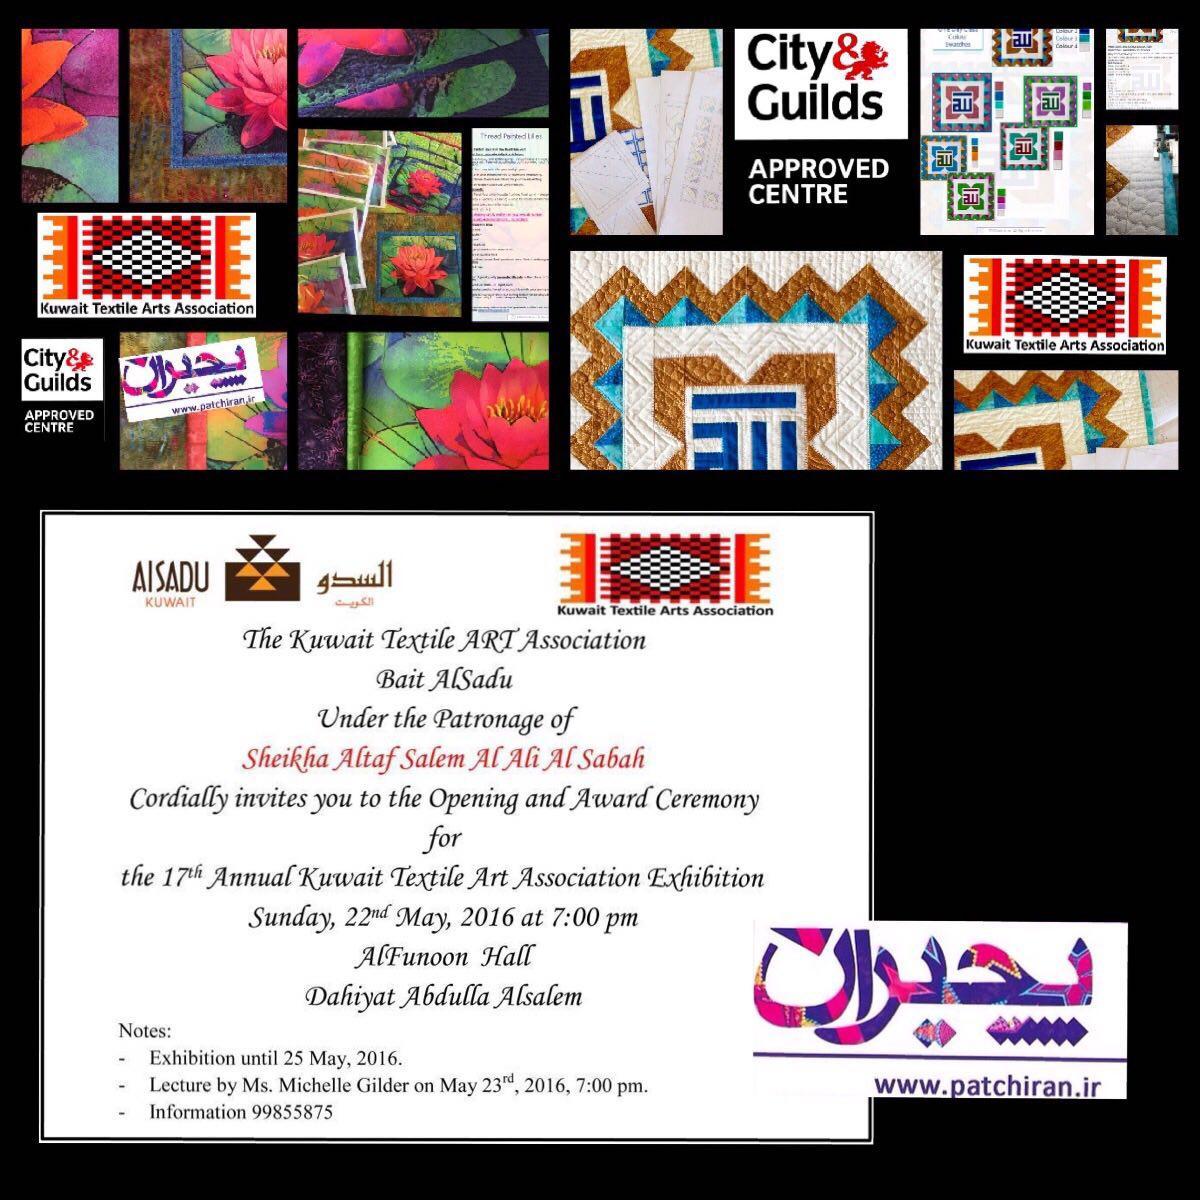 KTAA -  Patchiran Classes in Kuwait